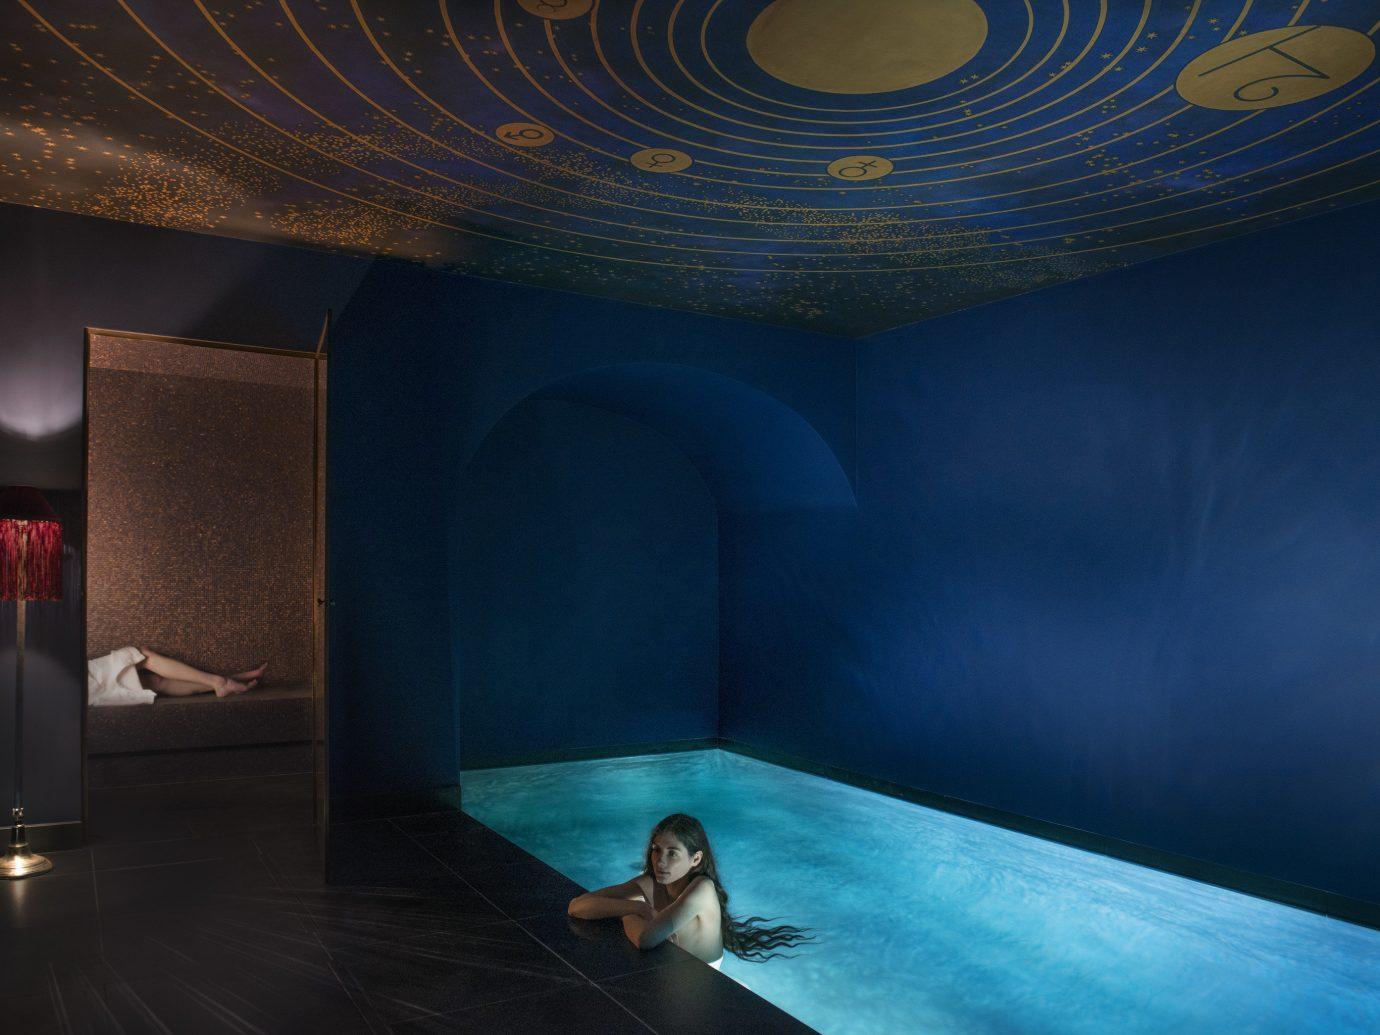 Hotels indoor light darkness stage screenshot interior design theatre swimming pool scenographer